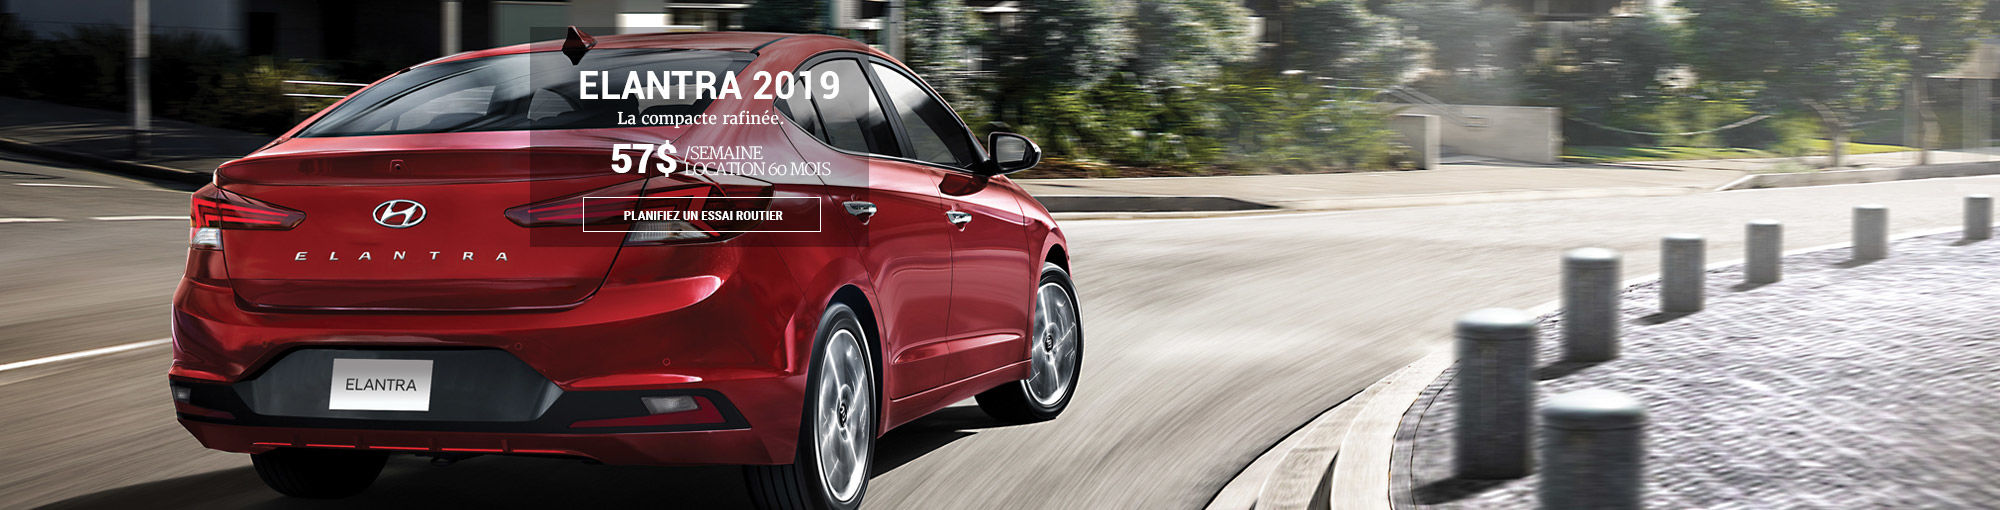 Hyundai elantra header 2019-  février